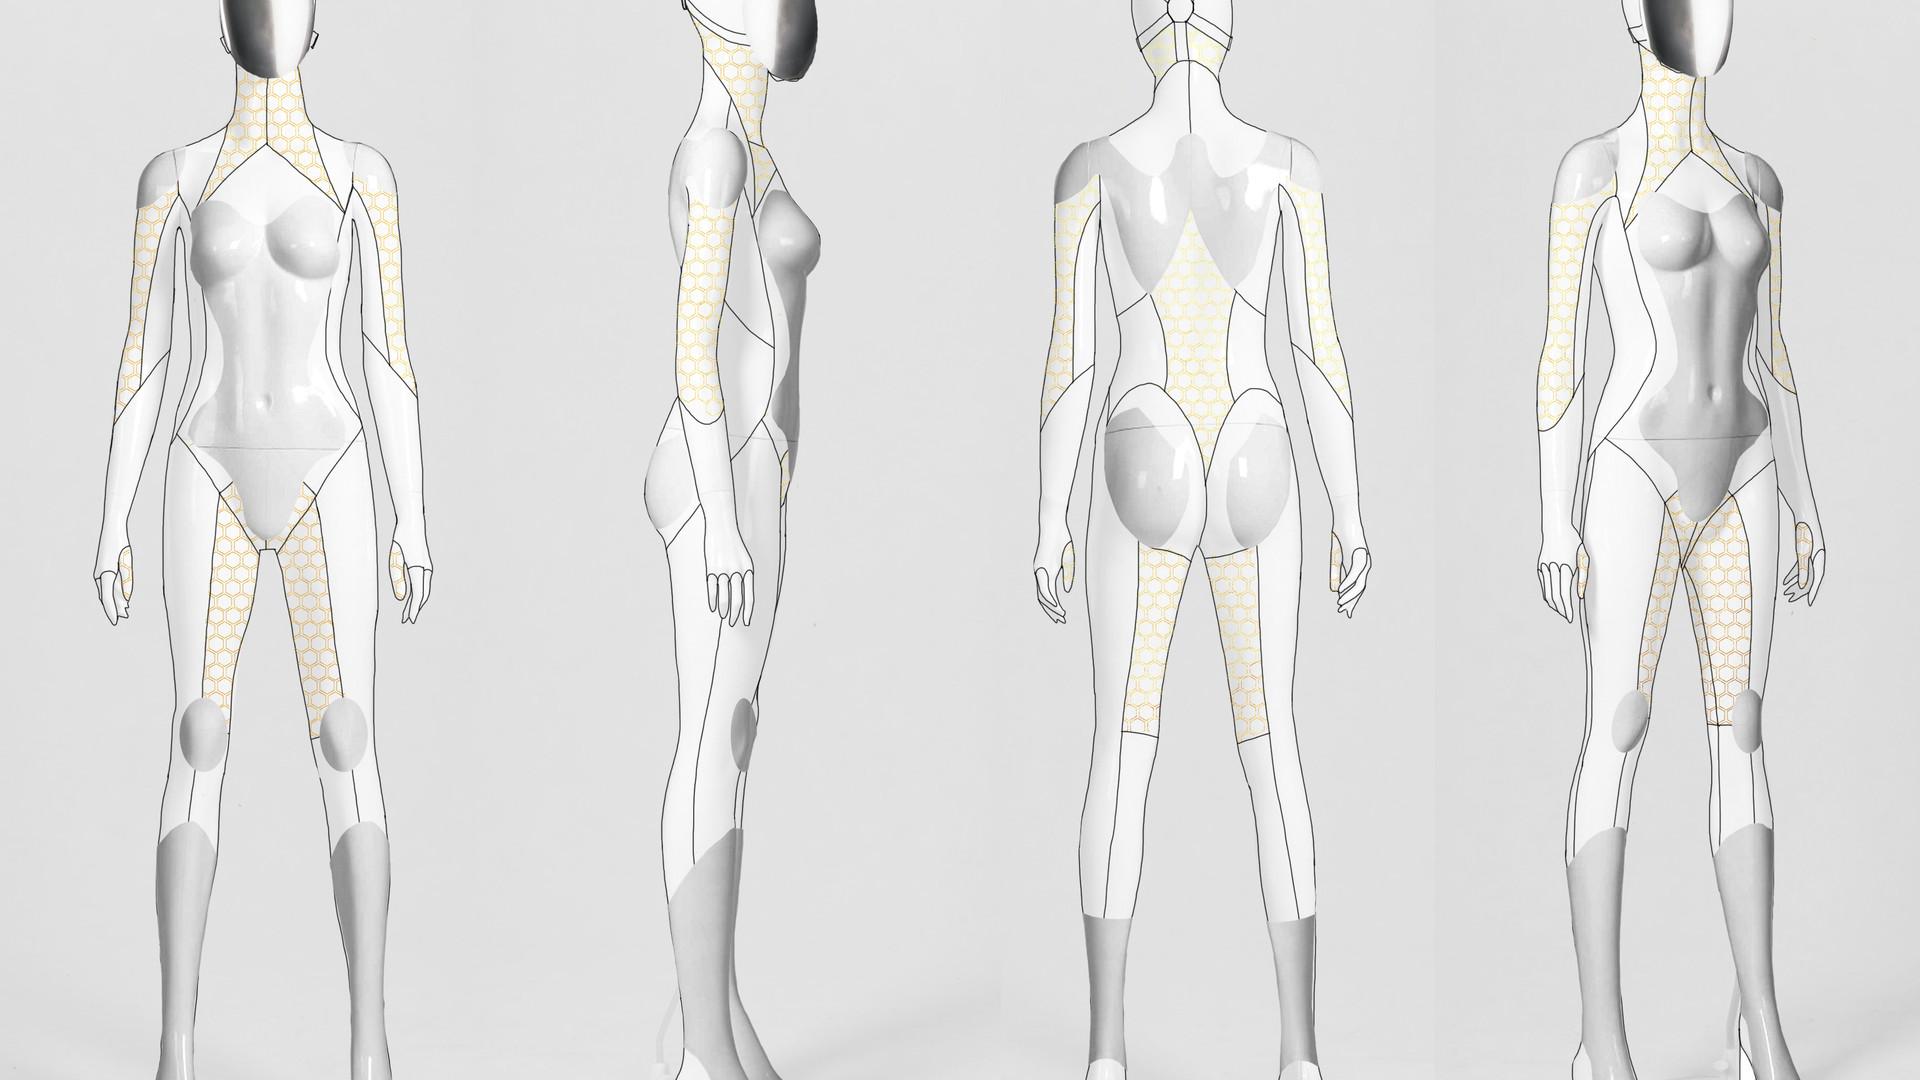 LGP_Servant-Women_outfit.jpg